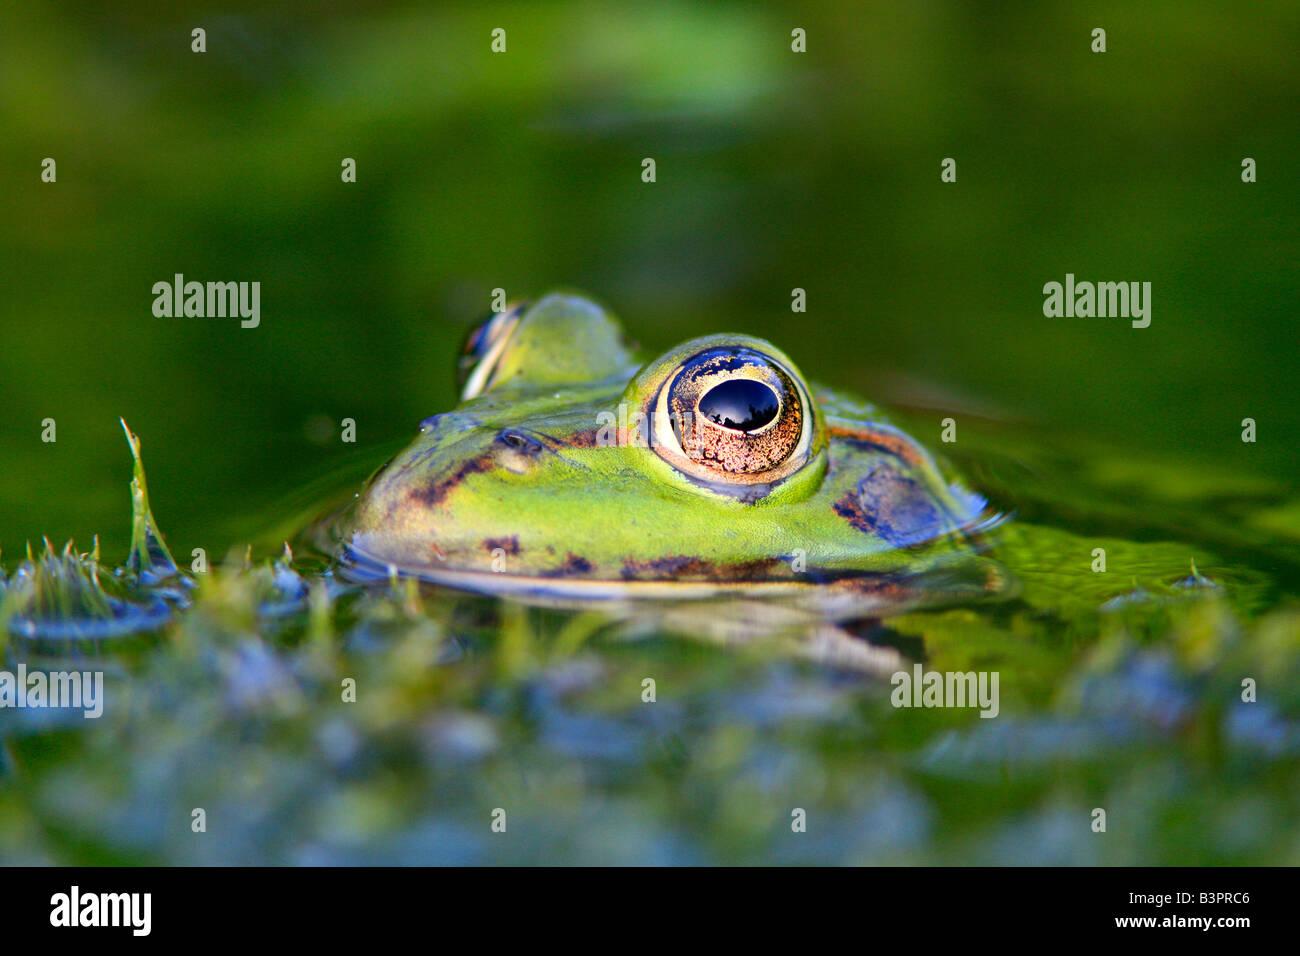 Edible Frog ( Pelophylax kl. esculentus), portrait - Stock Image